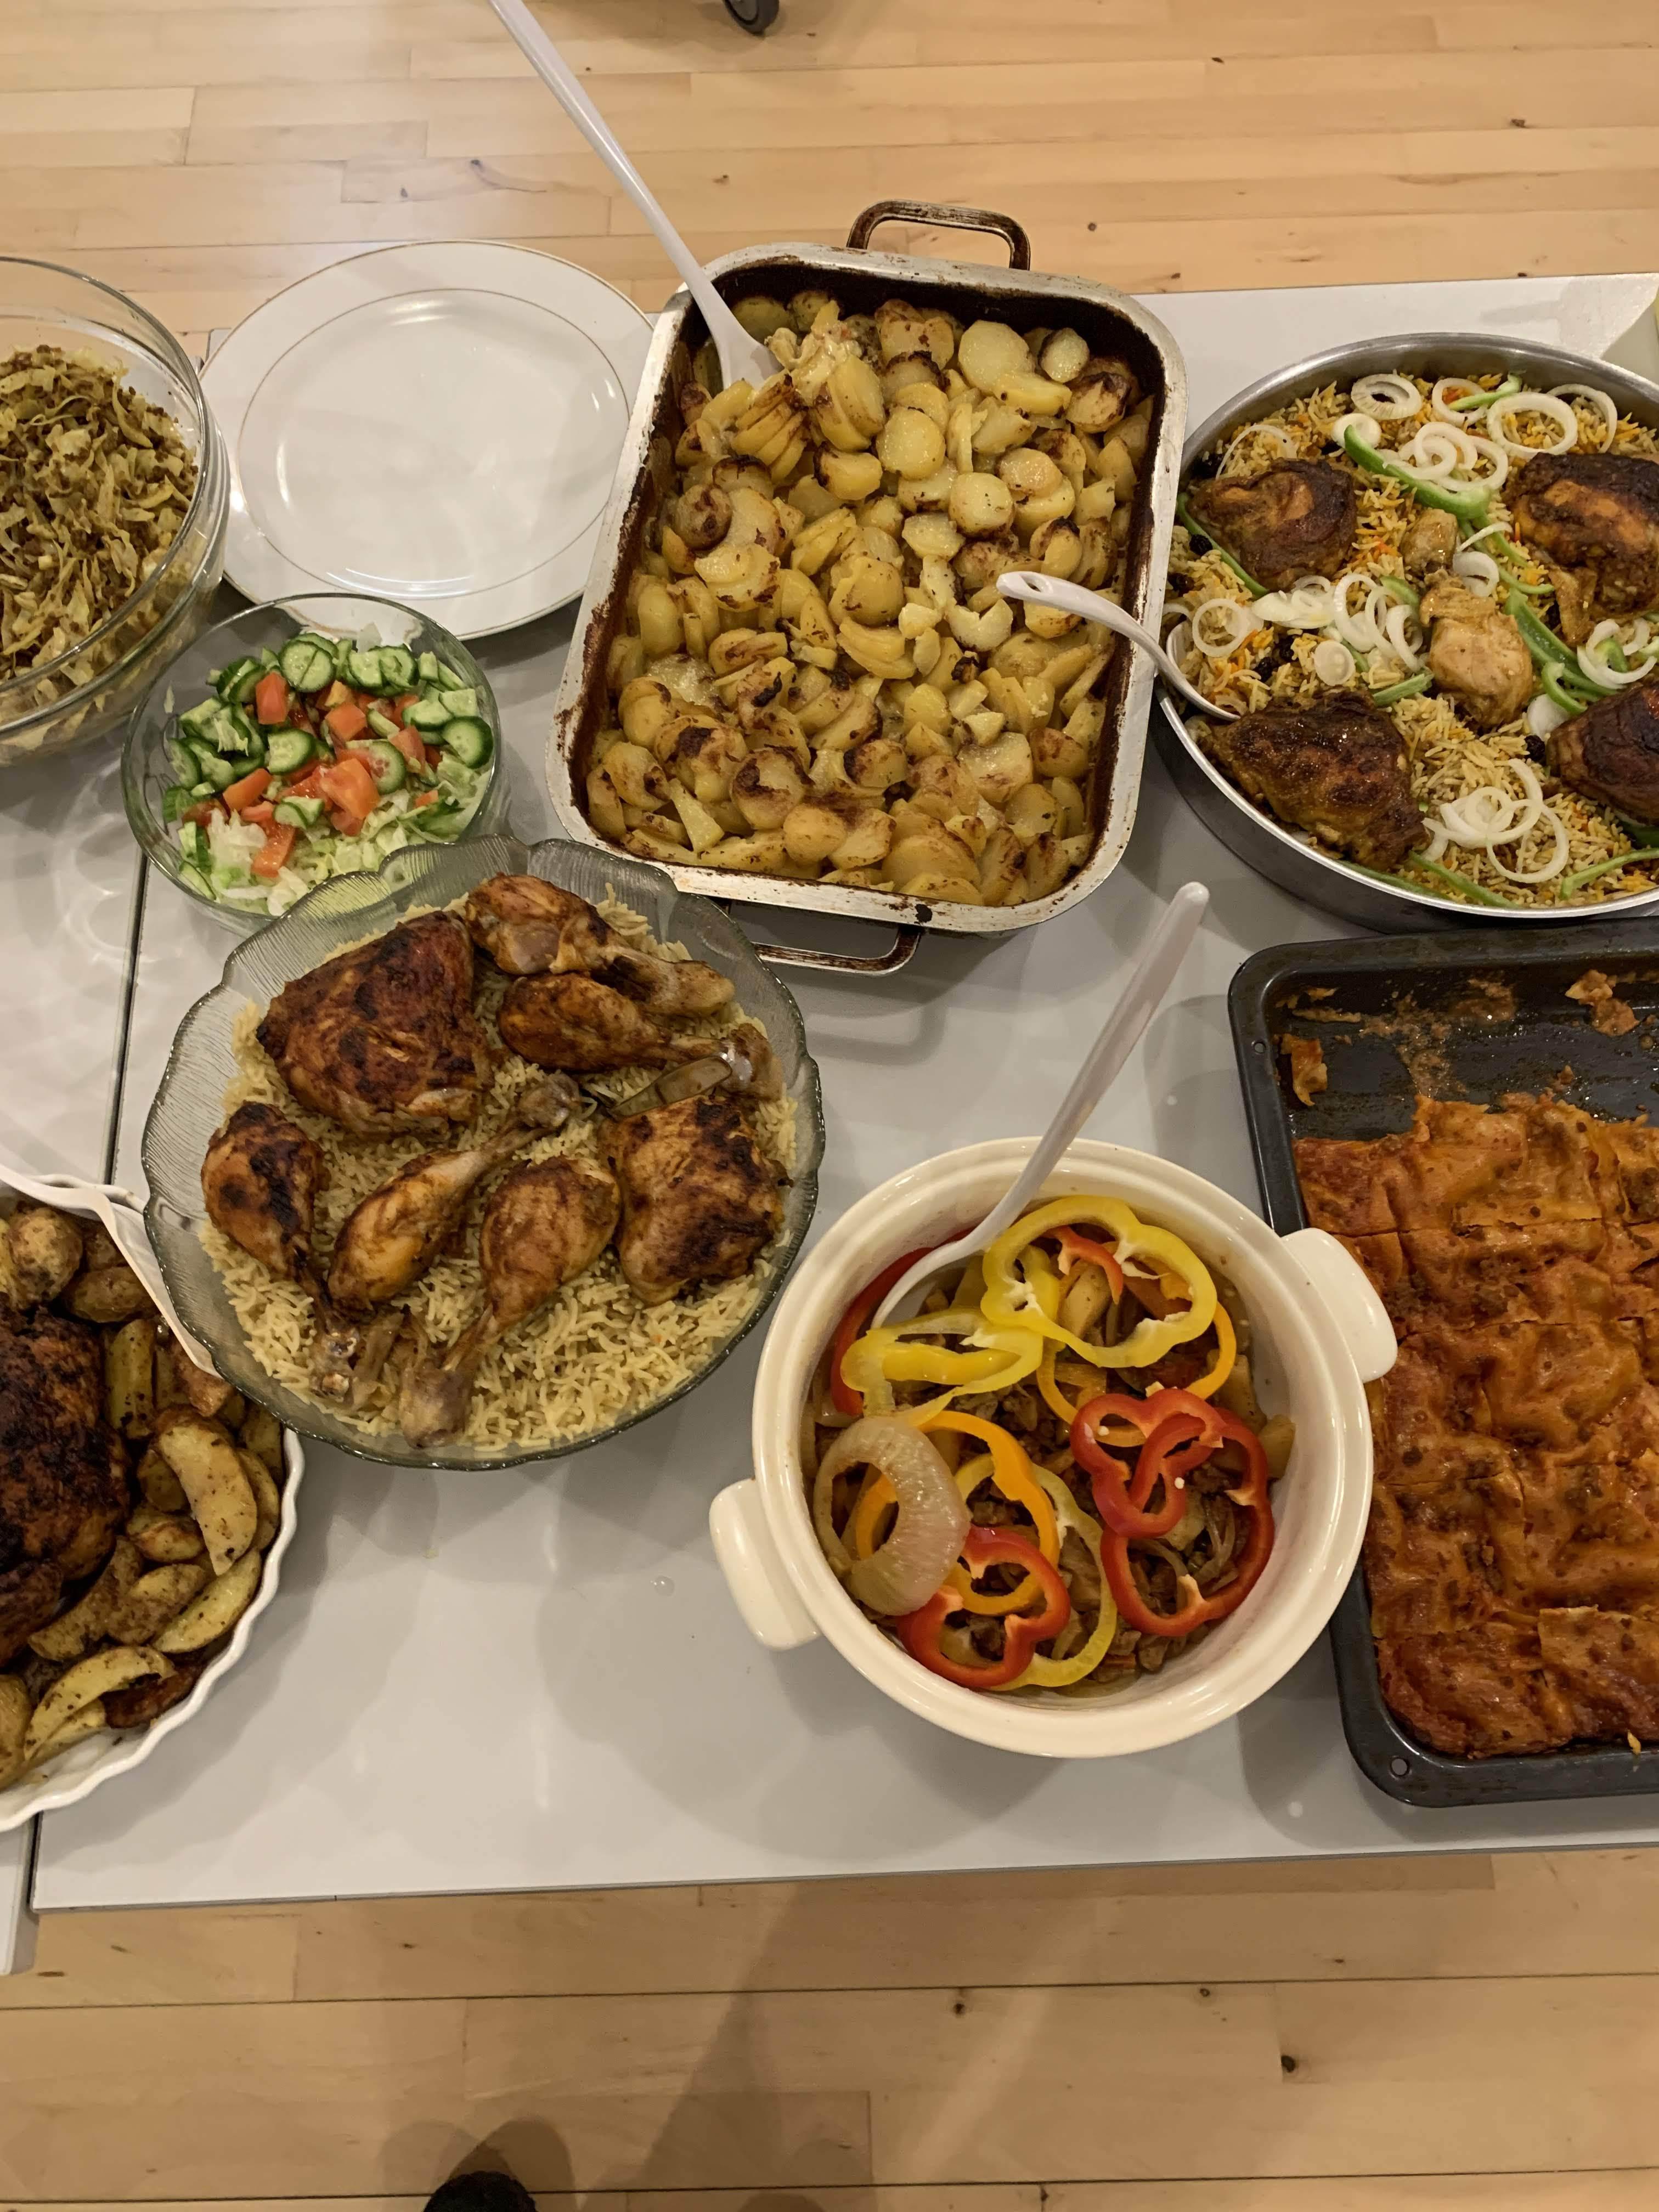 fællesspisning-den-28-12-2019-i-beboerhuset-på-Ellekonebakken-013